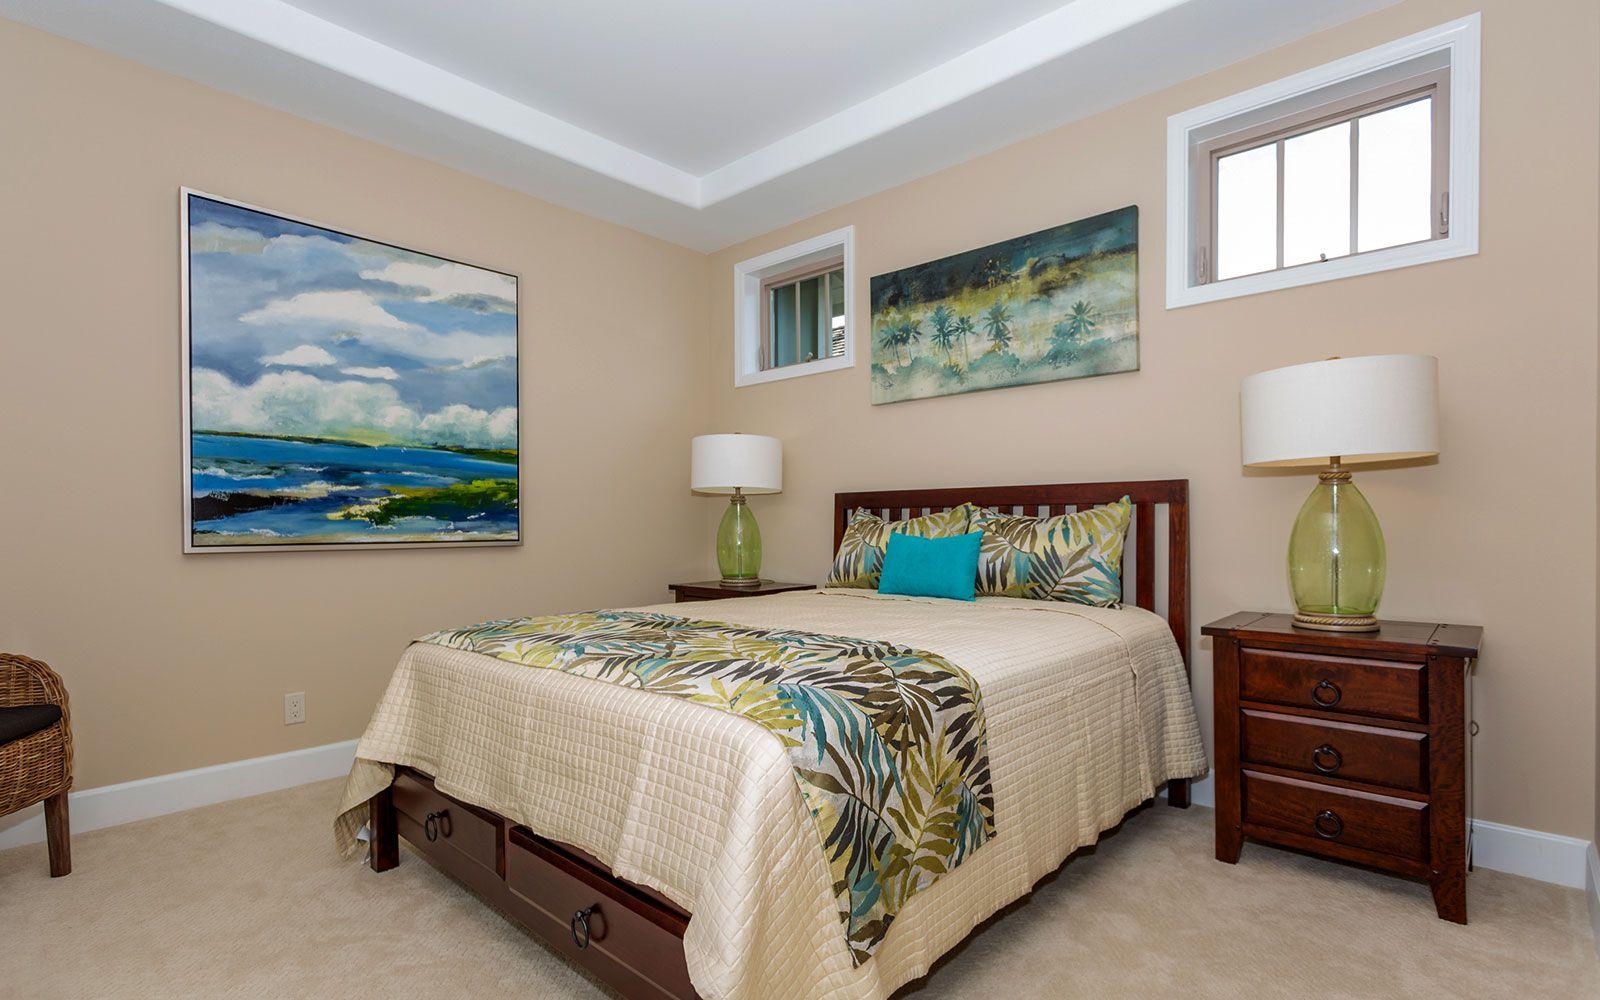 Bedroom featured in the Makai Plan 4 By Brookfield Residential in Hawaii Island, HI